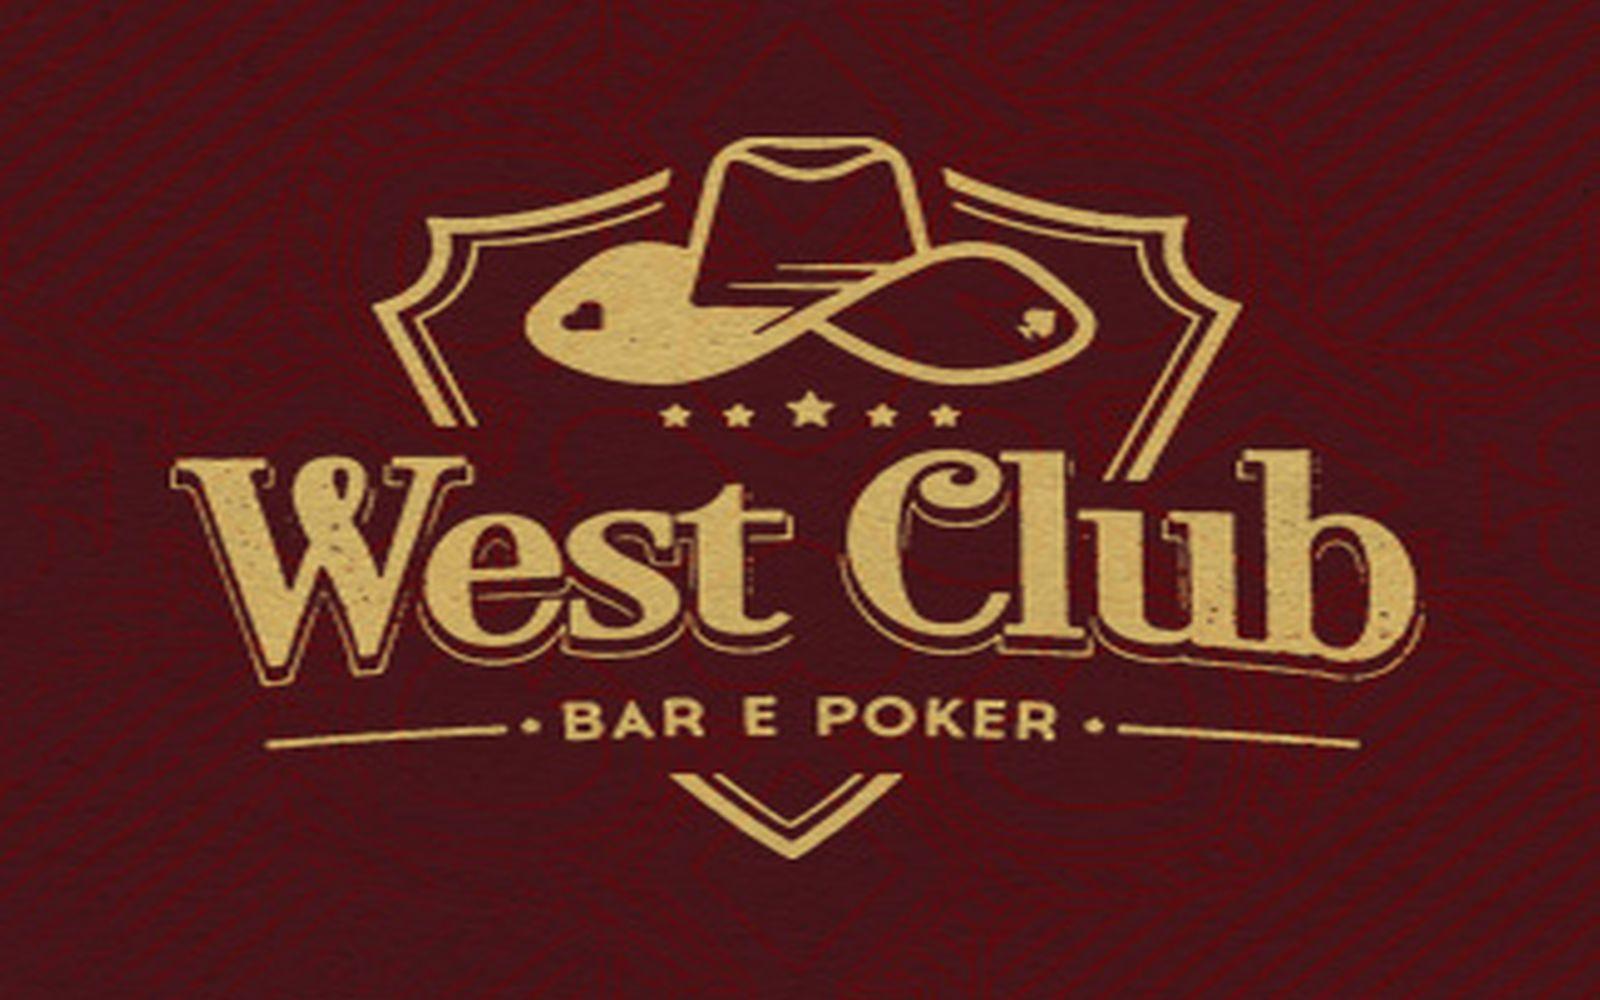 West Club Poker